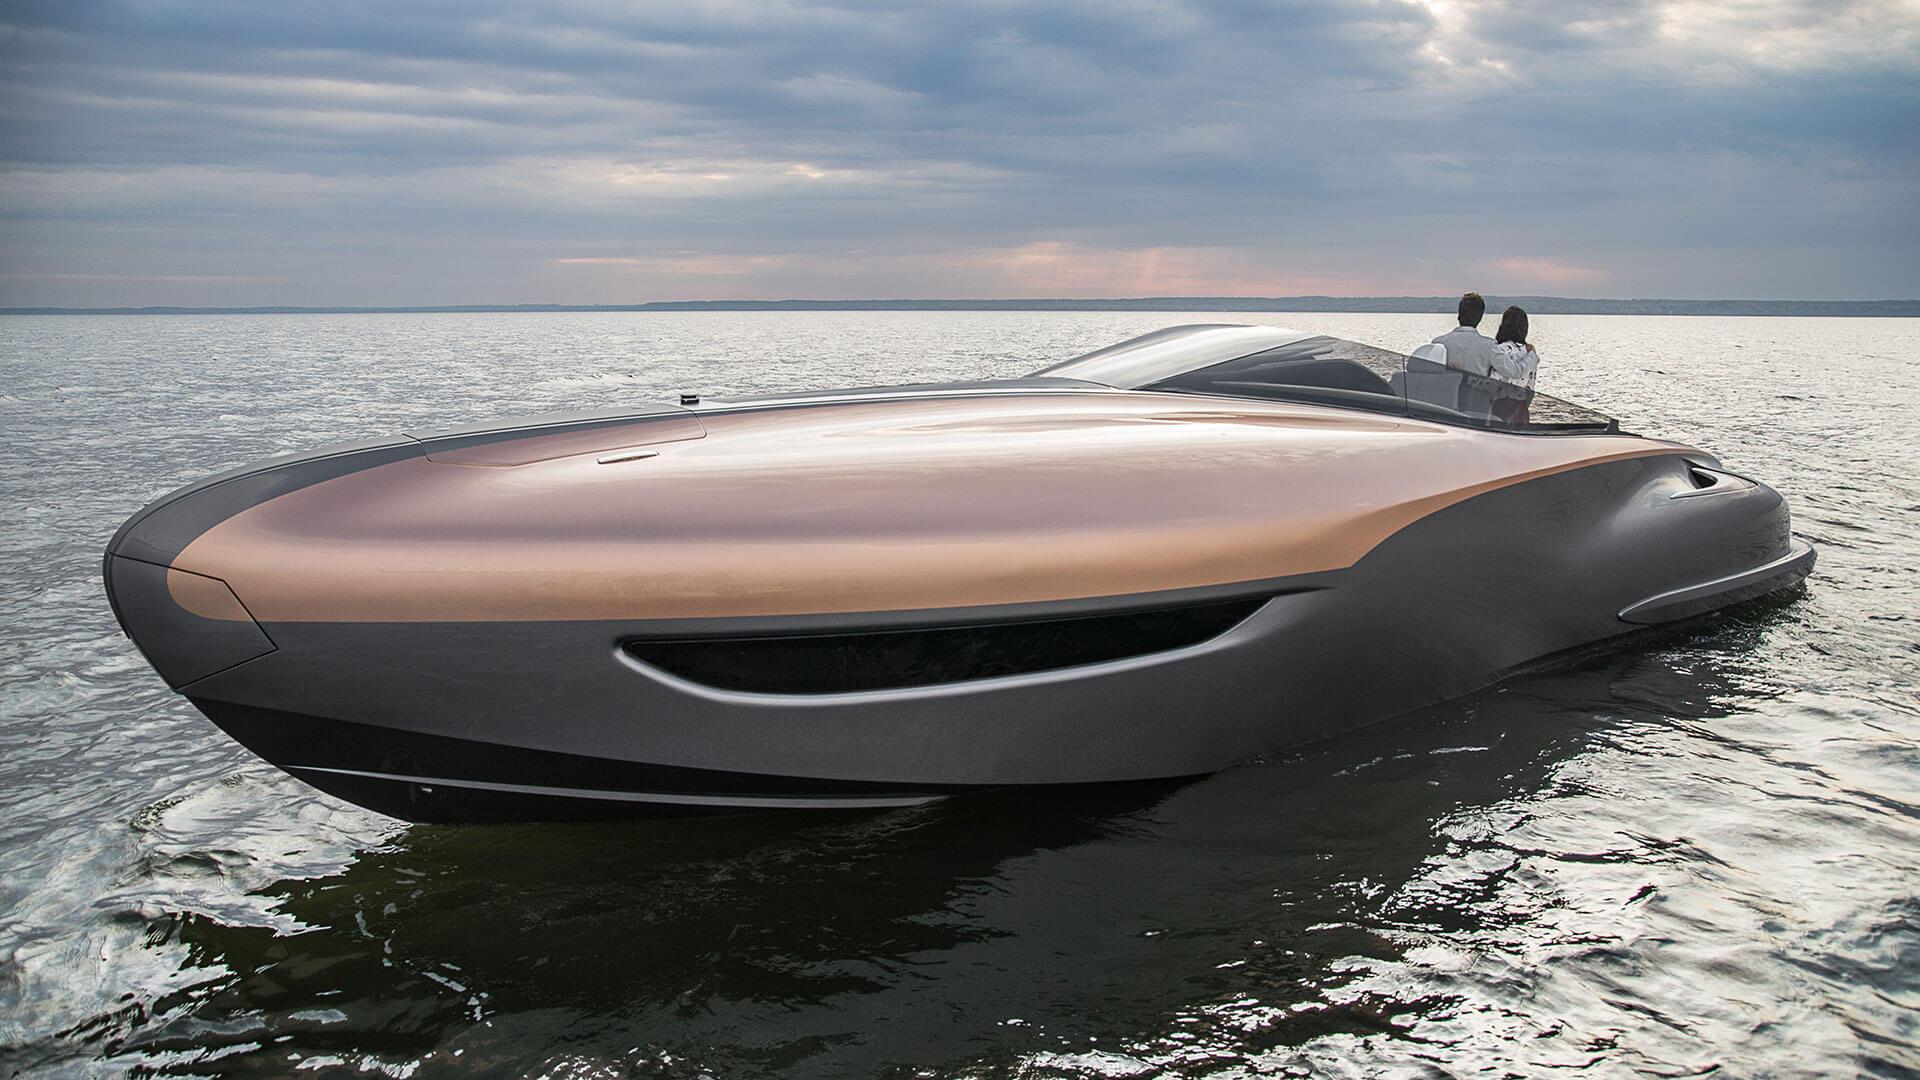 2017-lexus-yacht-gallery03-1920x1080_tcm-3157-1030961